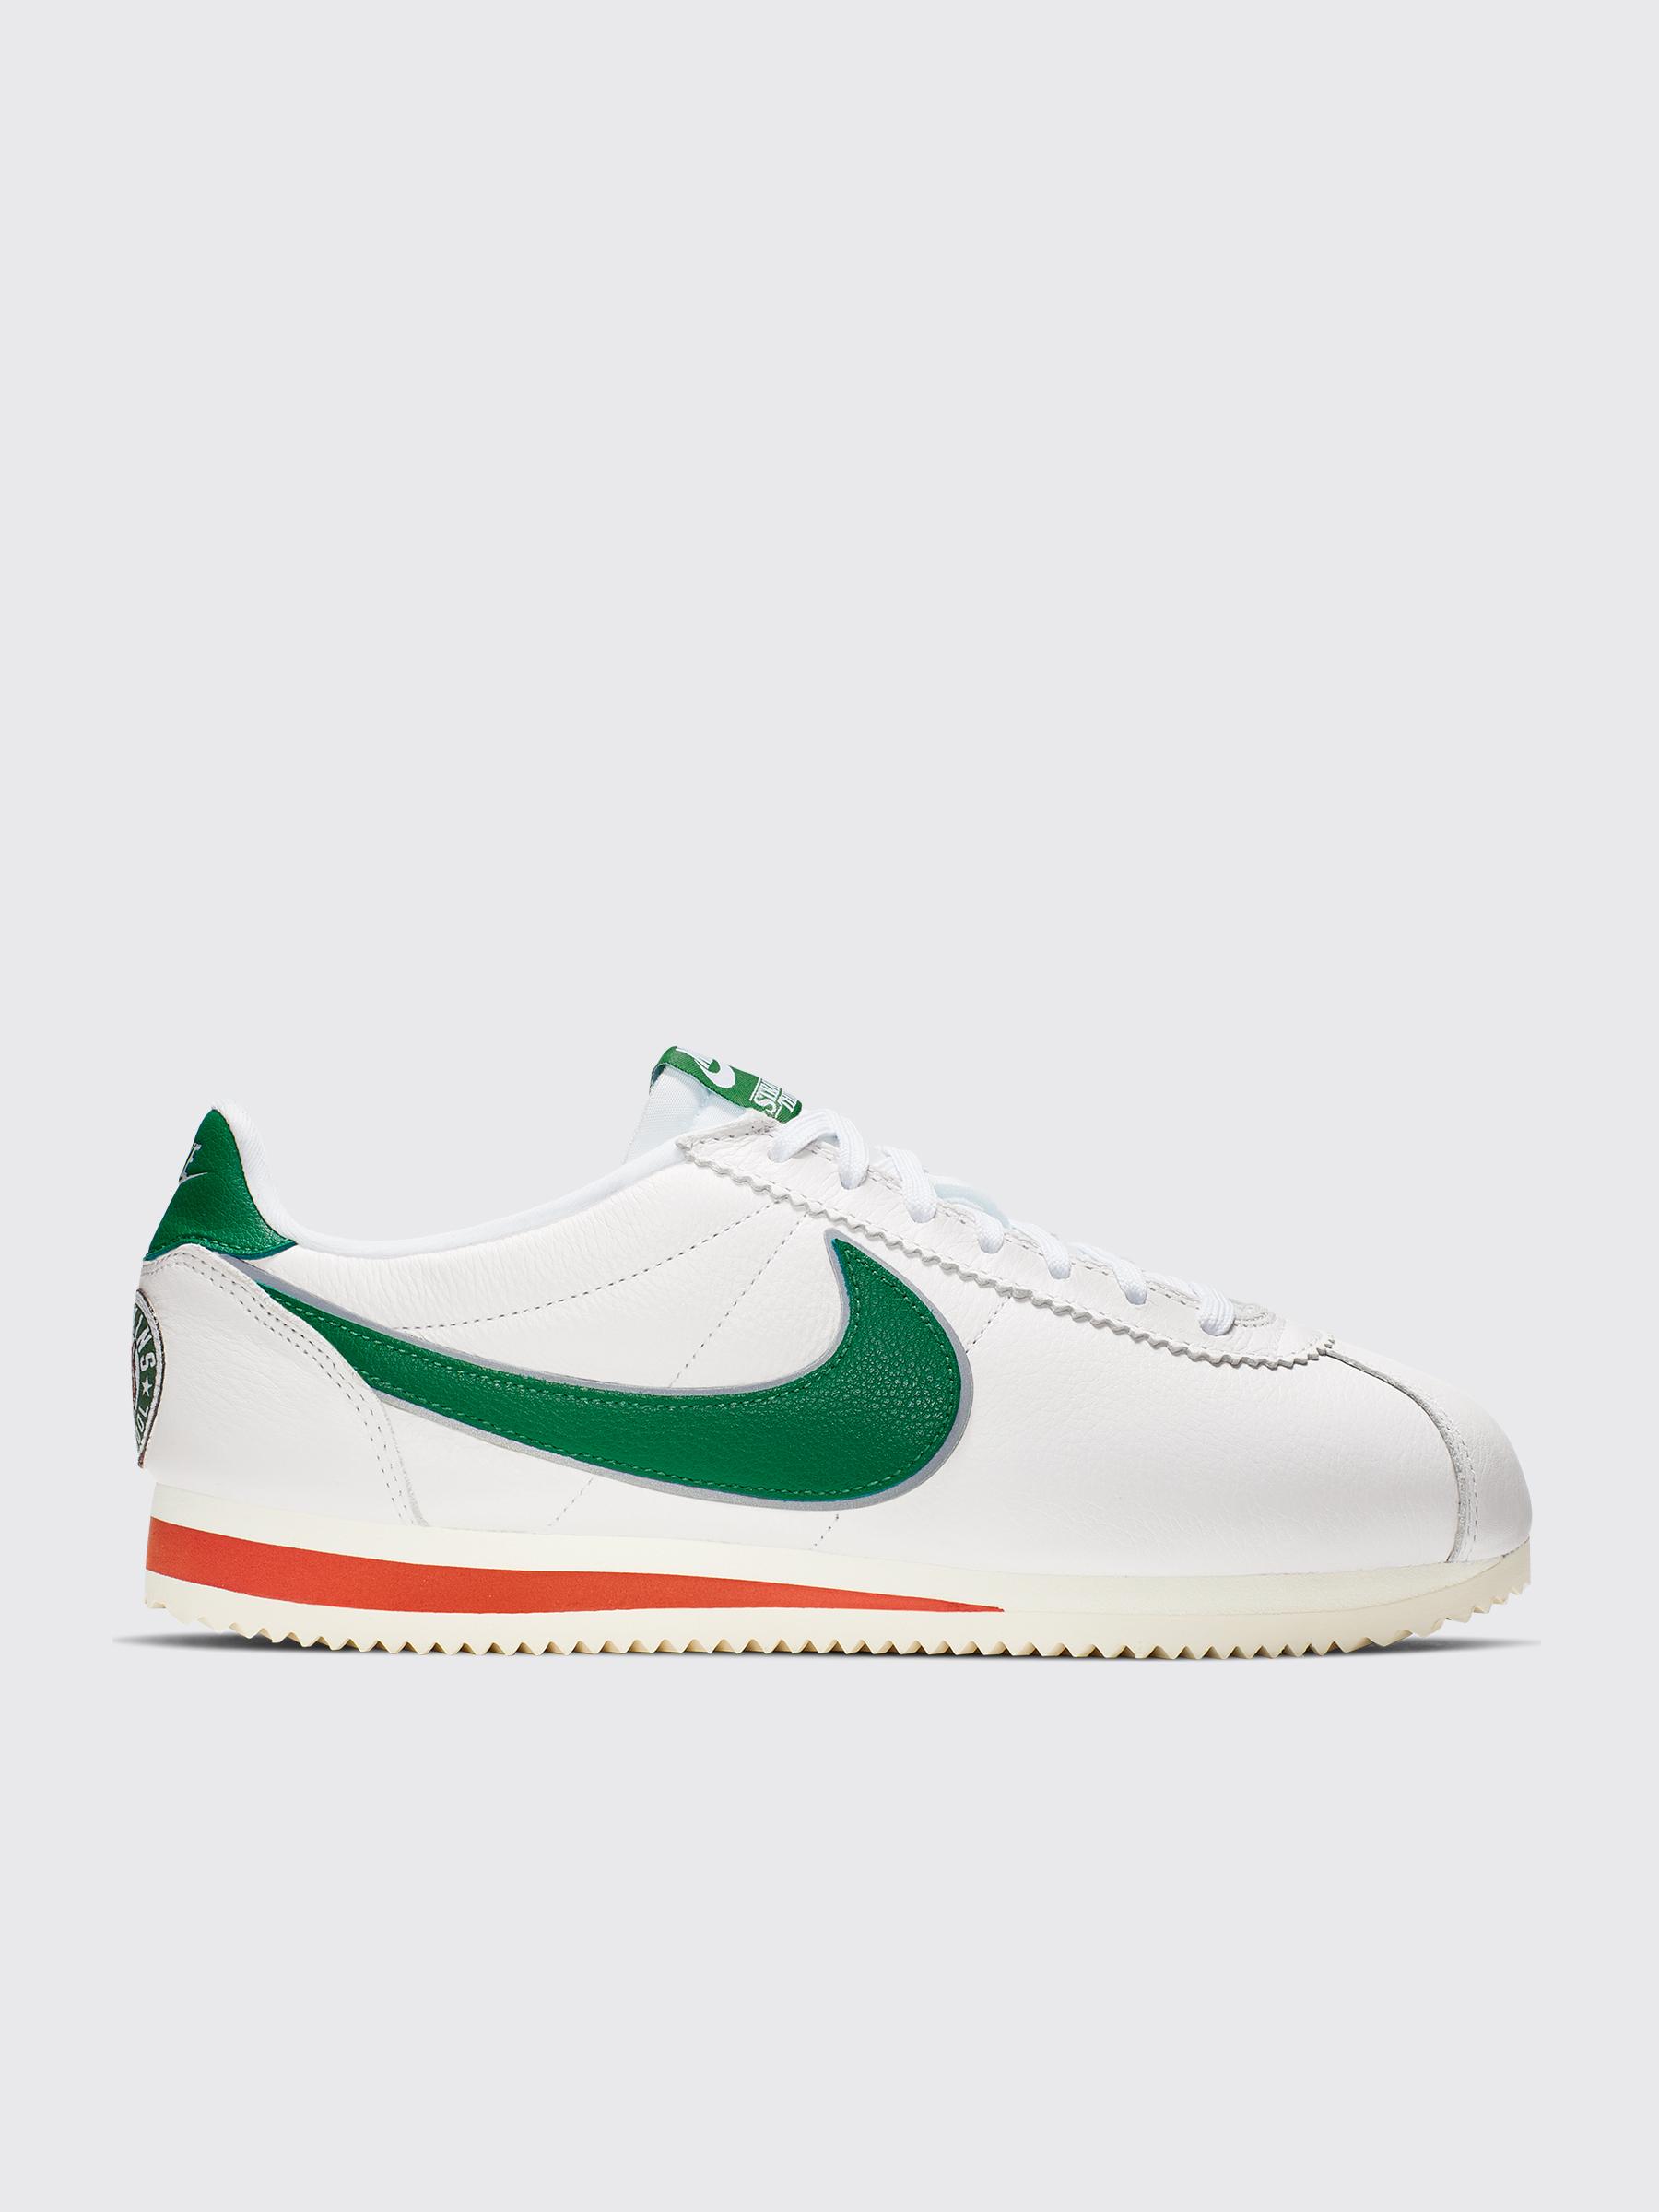 info for b73b4 057b9 Très Bien - Nike x Stranger Things Classic Cortez White   Pine Green